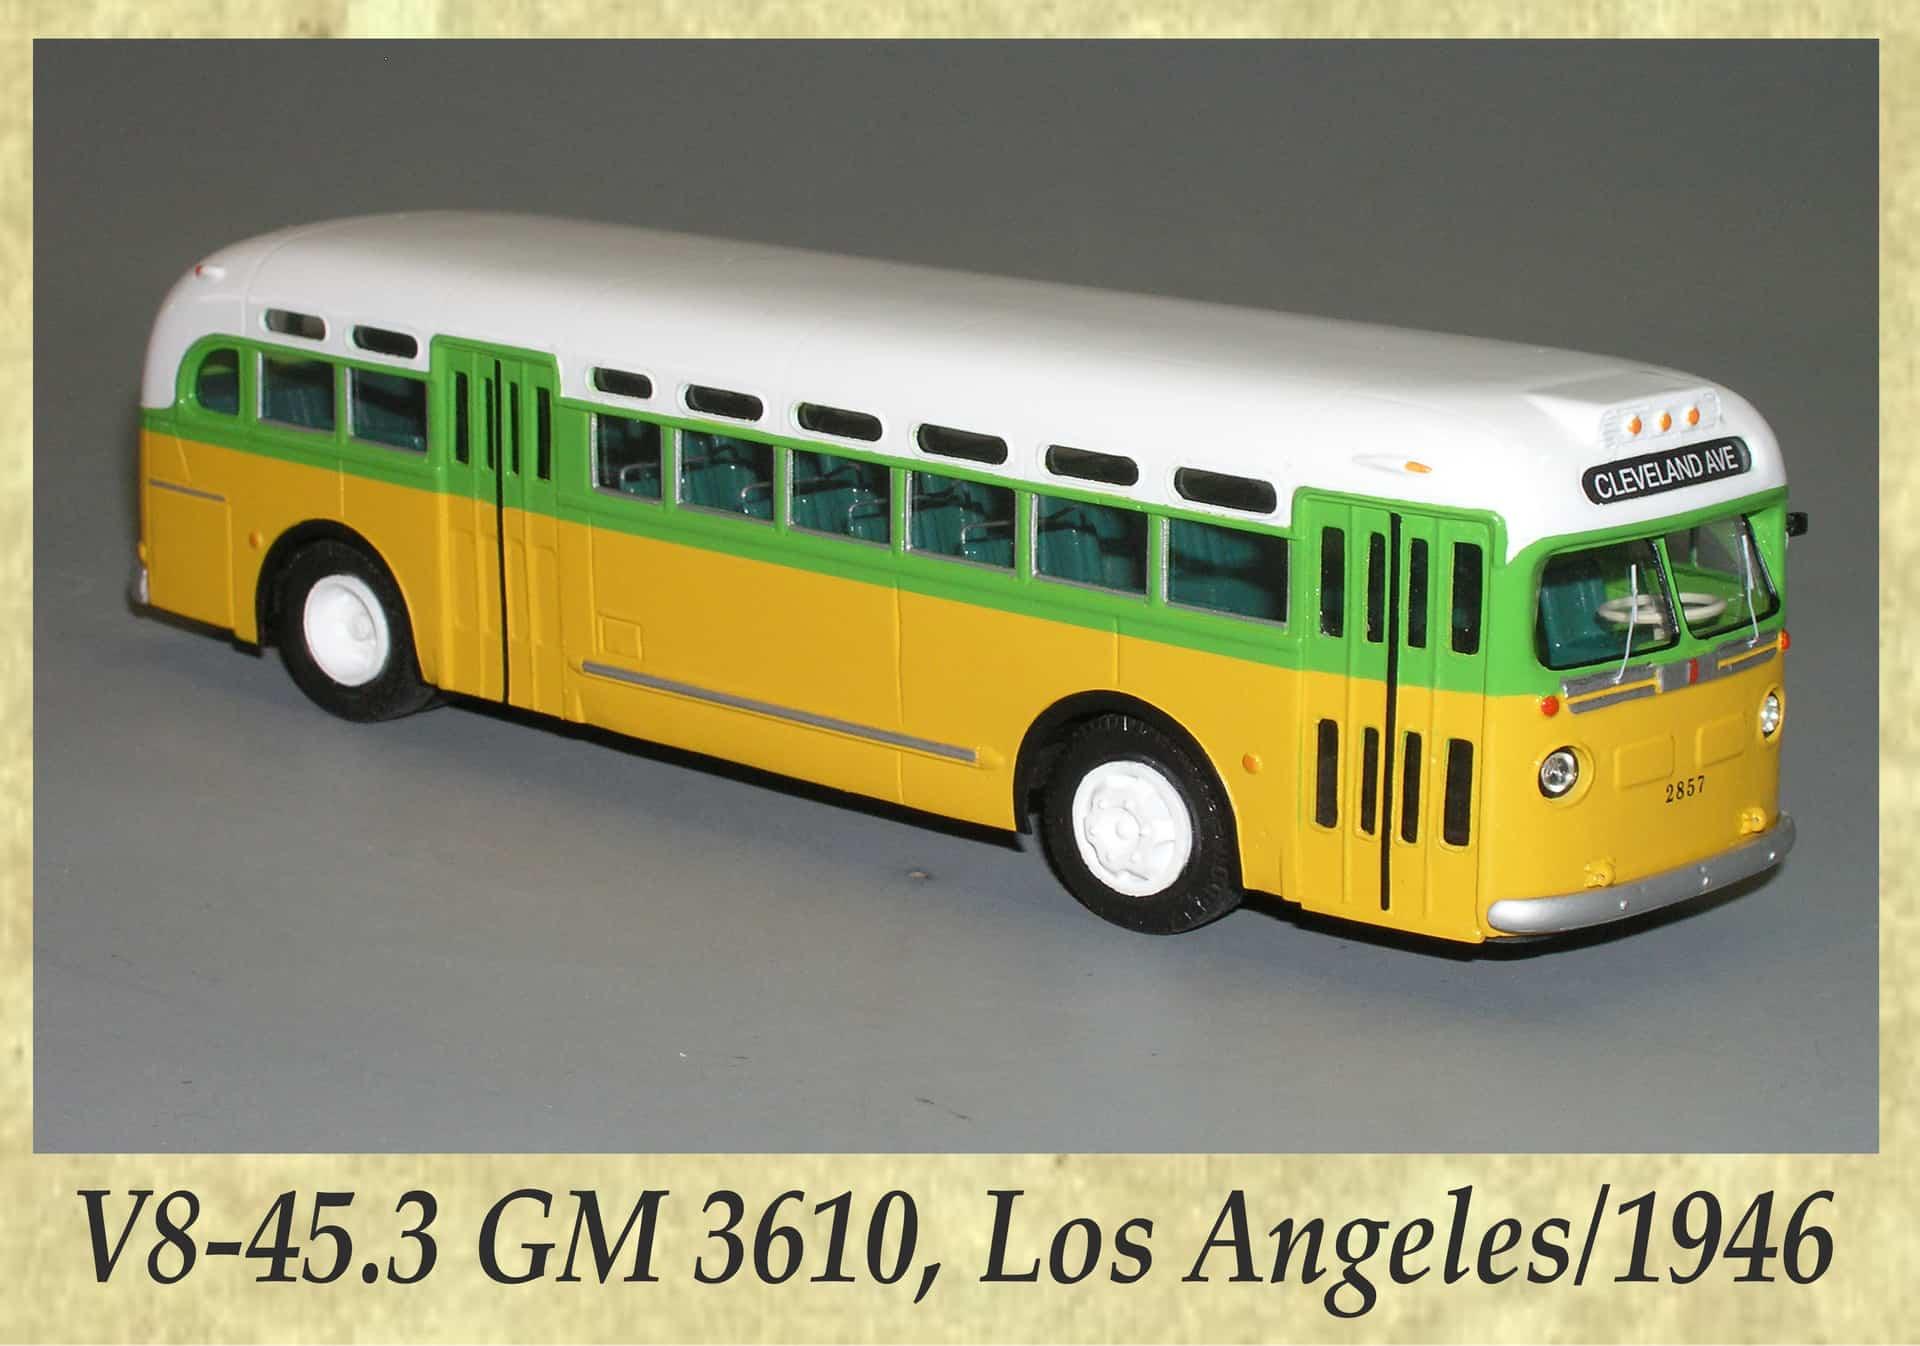 V8-45.3 GM 3610, Los Angeles 1946